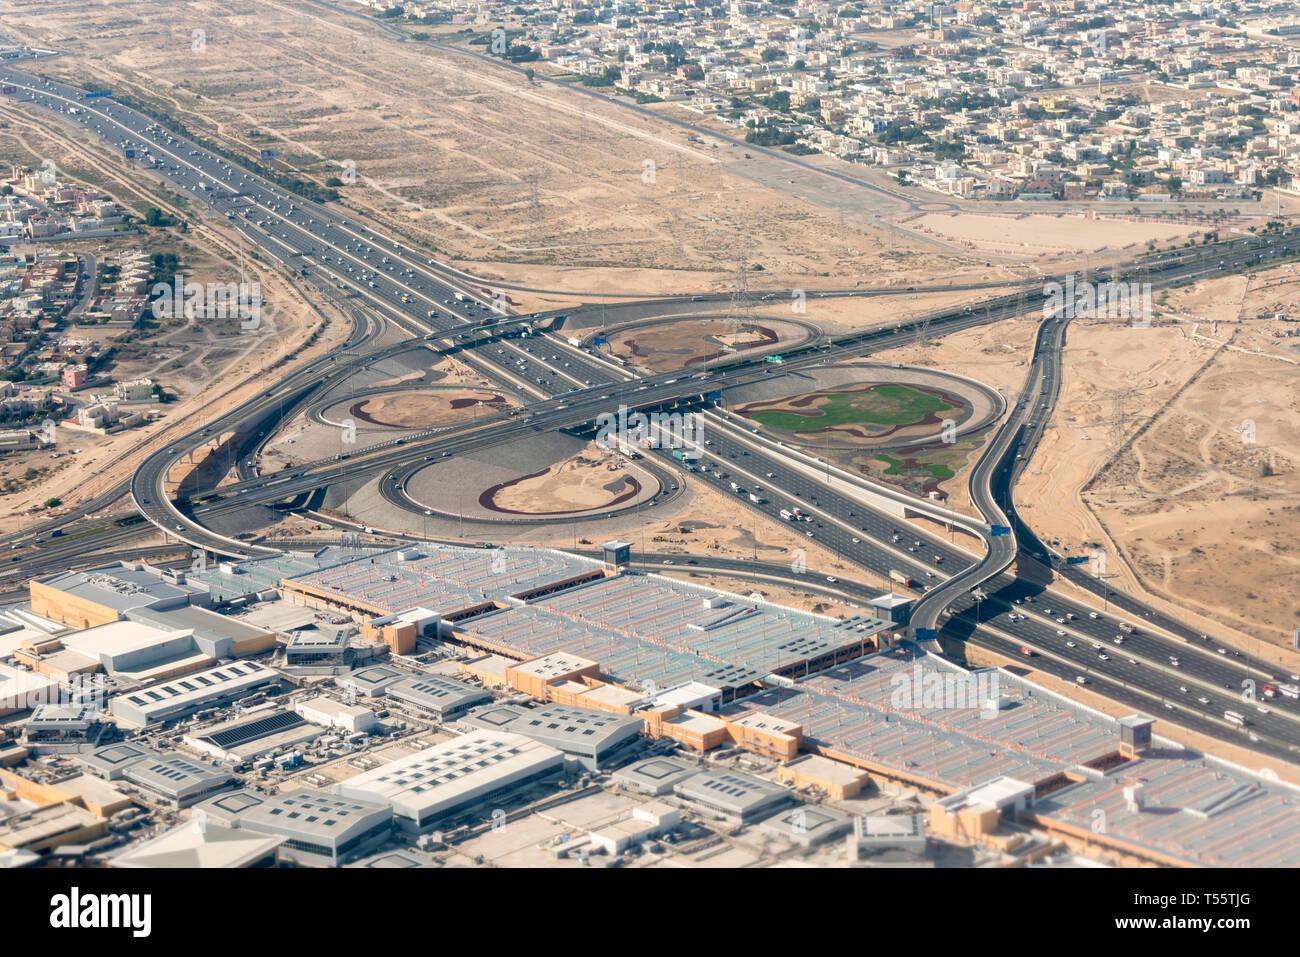 Aerial view of highway in Dubai, United Arab Emirates - Stock Image